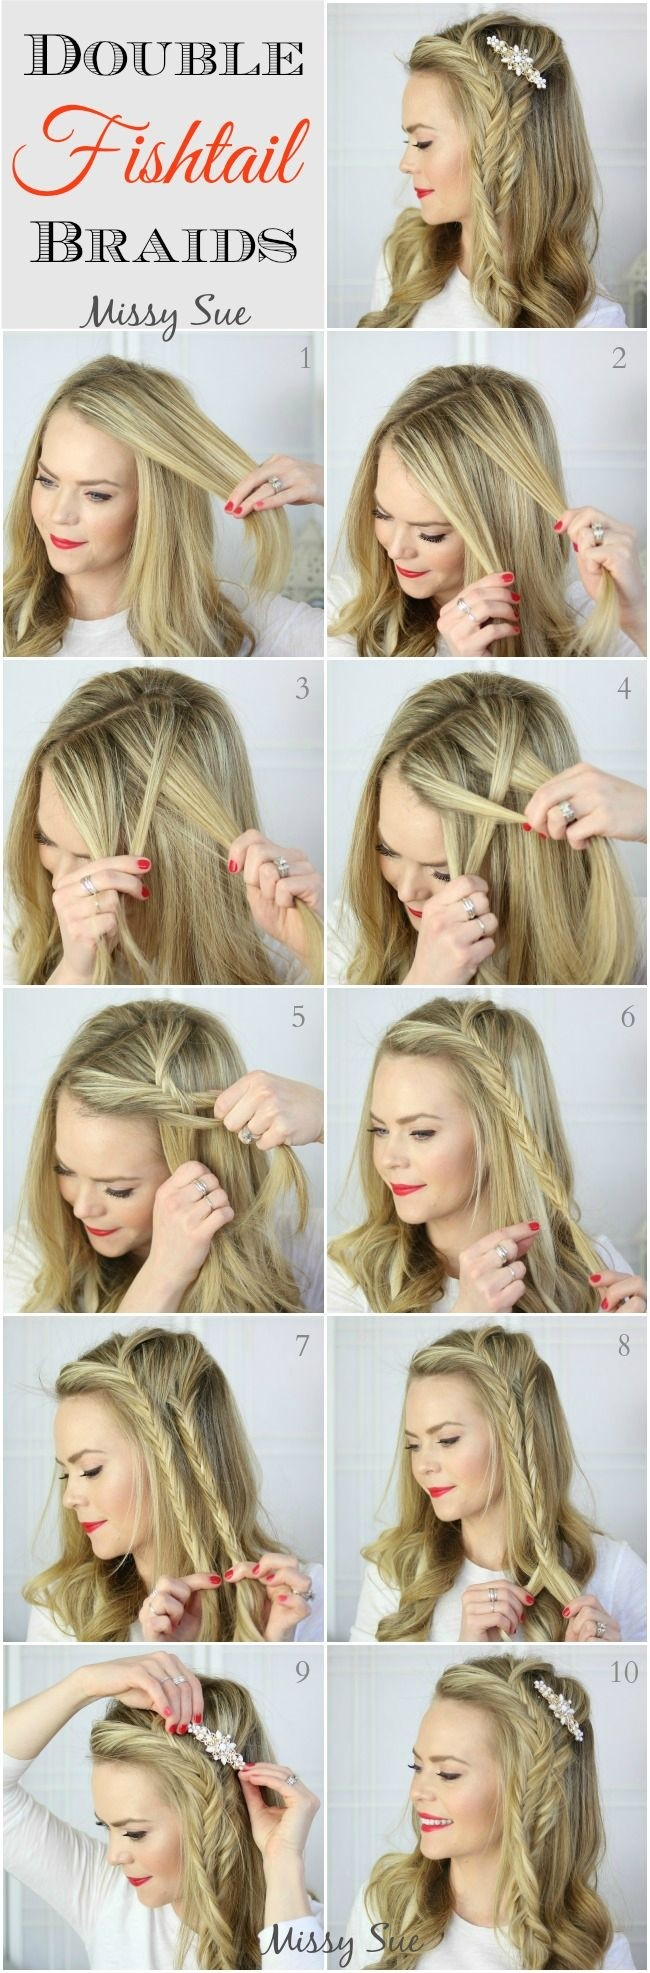 12 Amazing French Braid Hairstyles Tutorials Pretty Designs